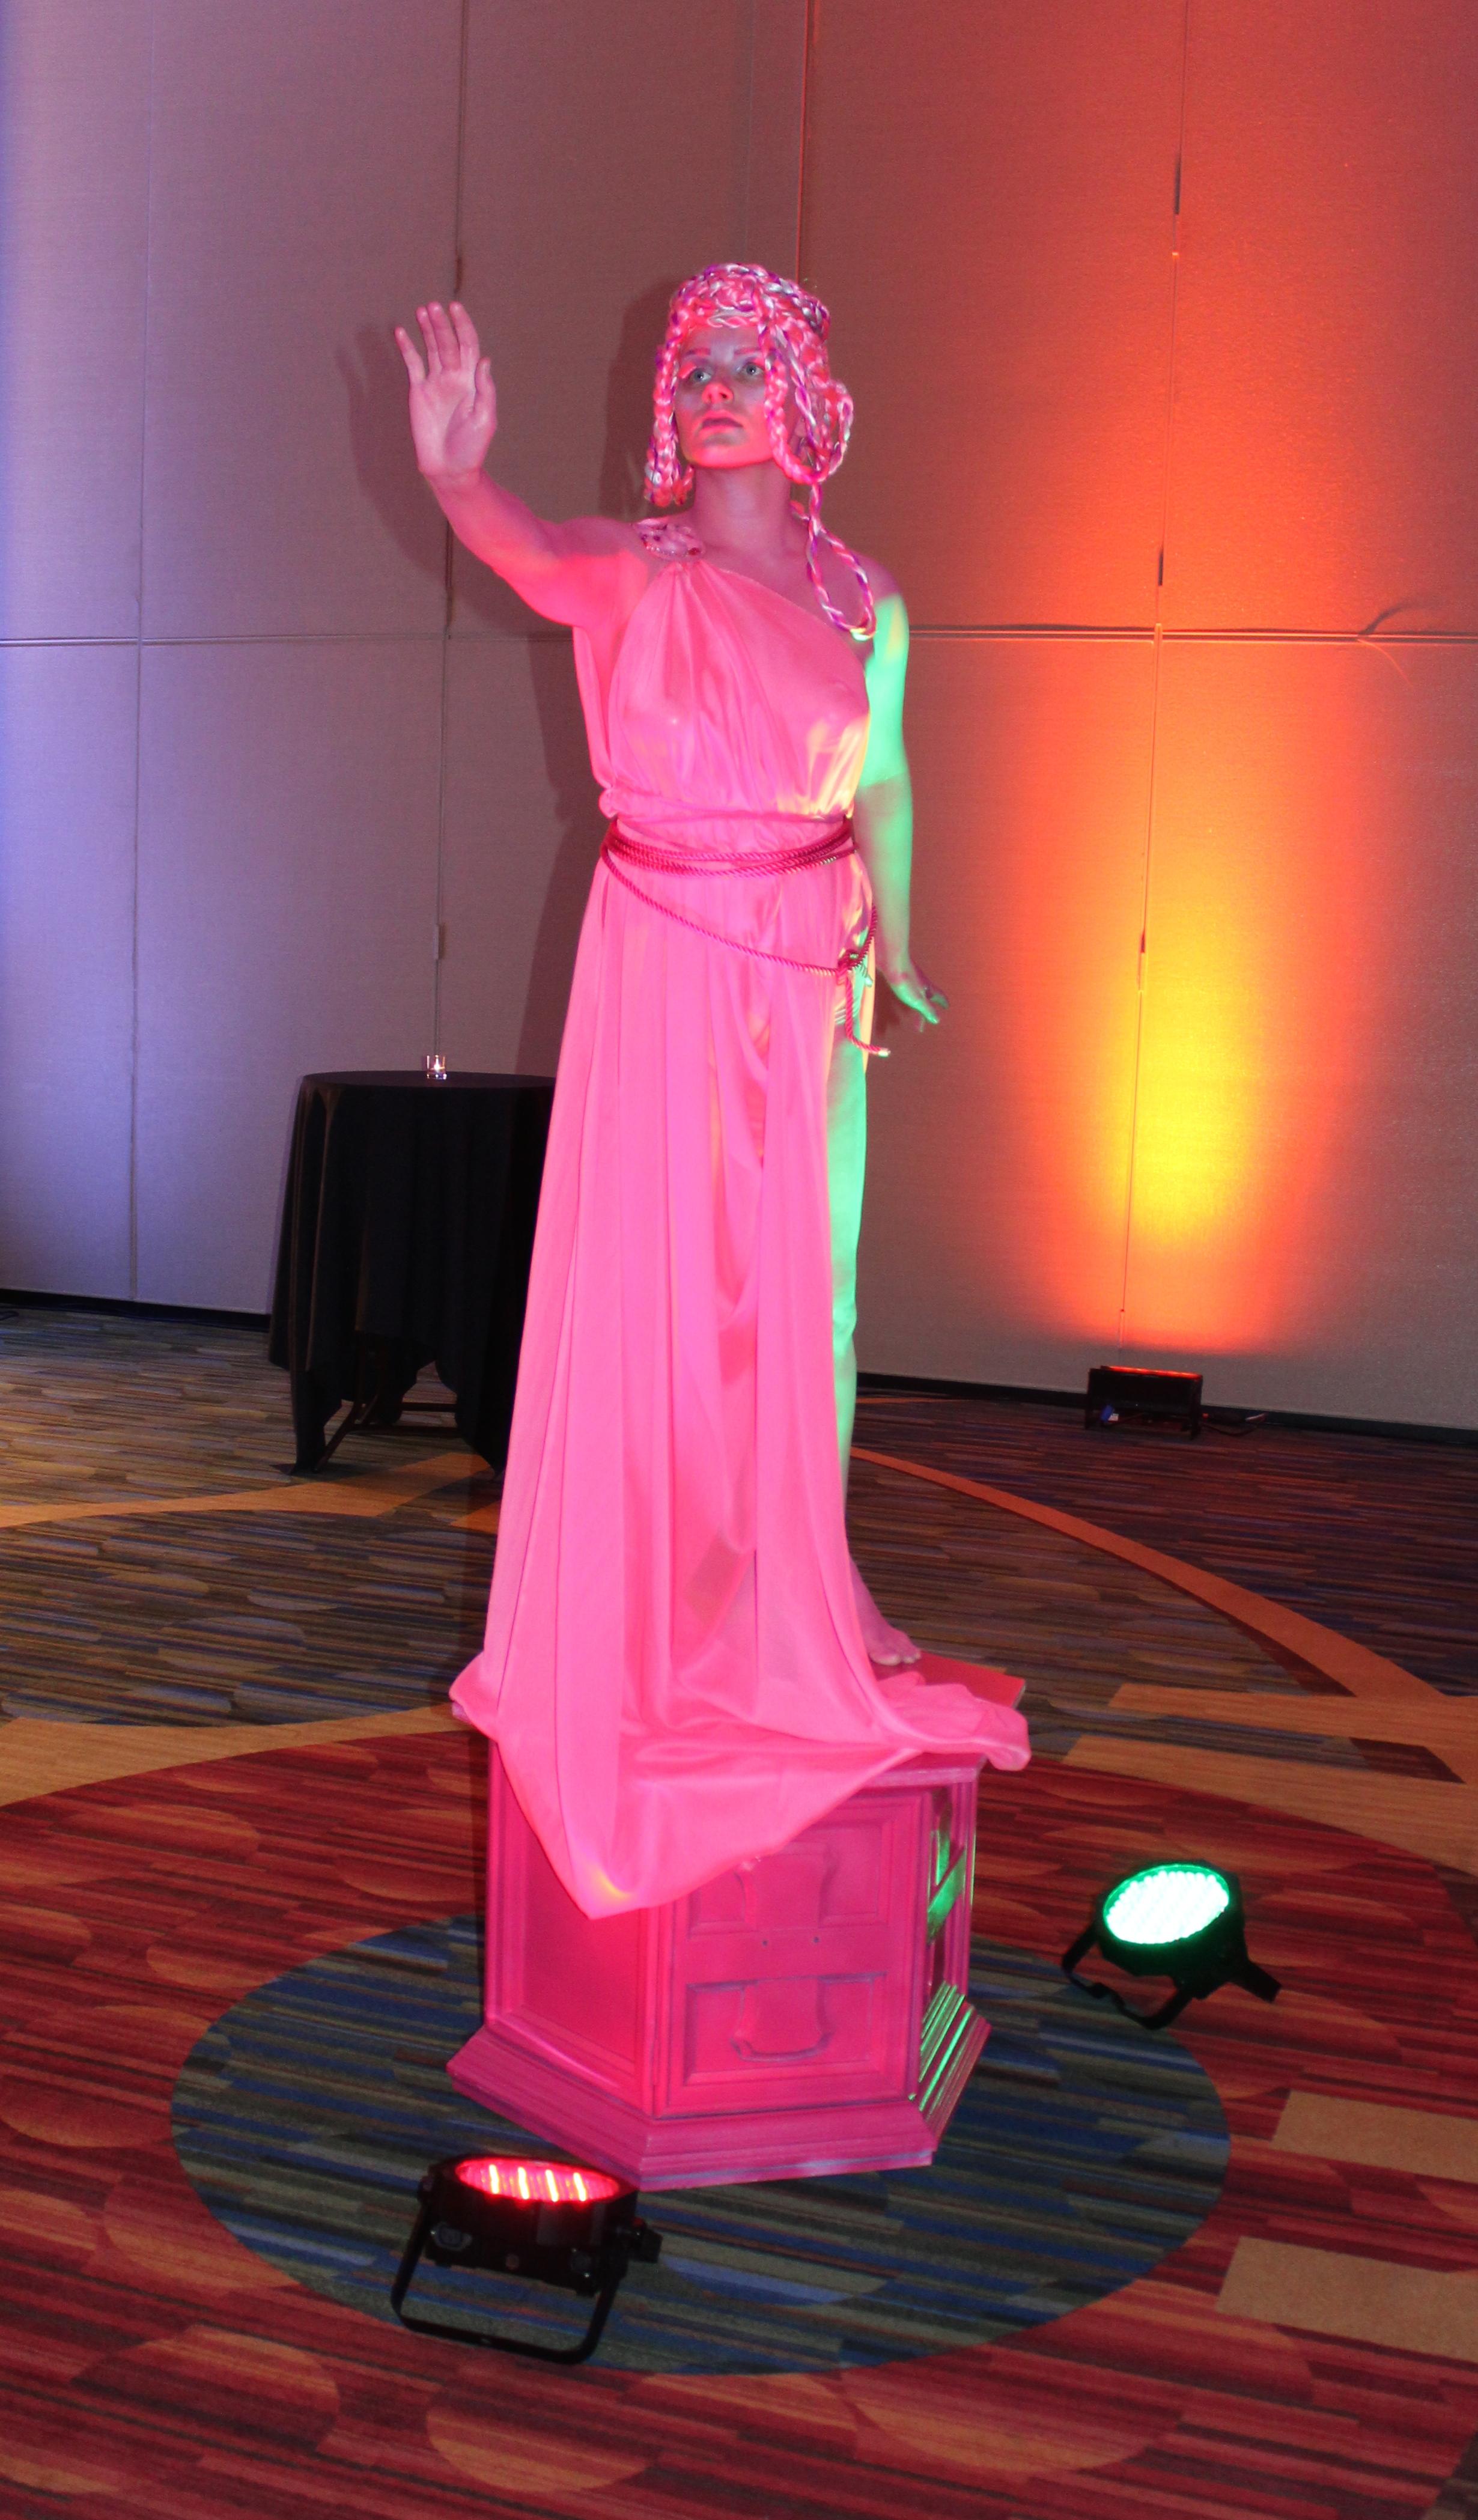 pinkstatue.JPG